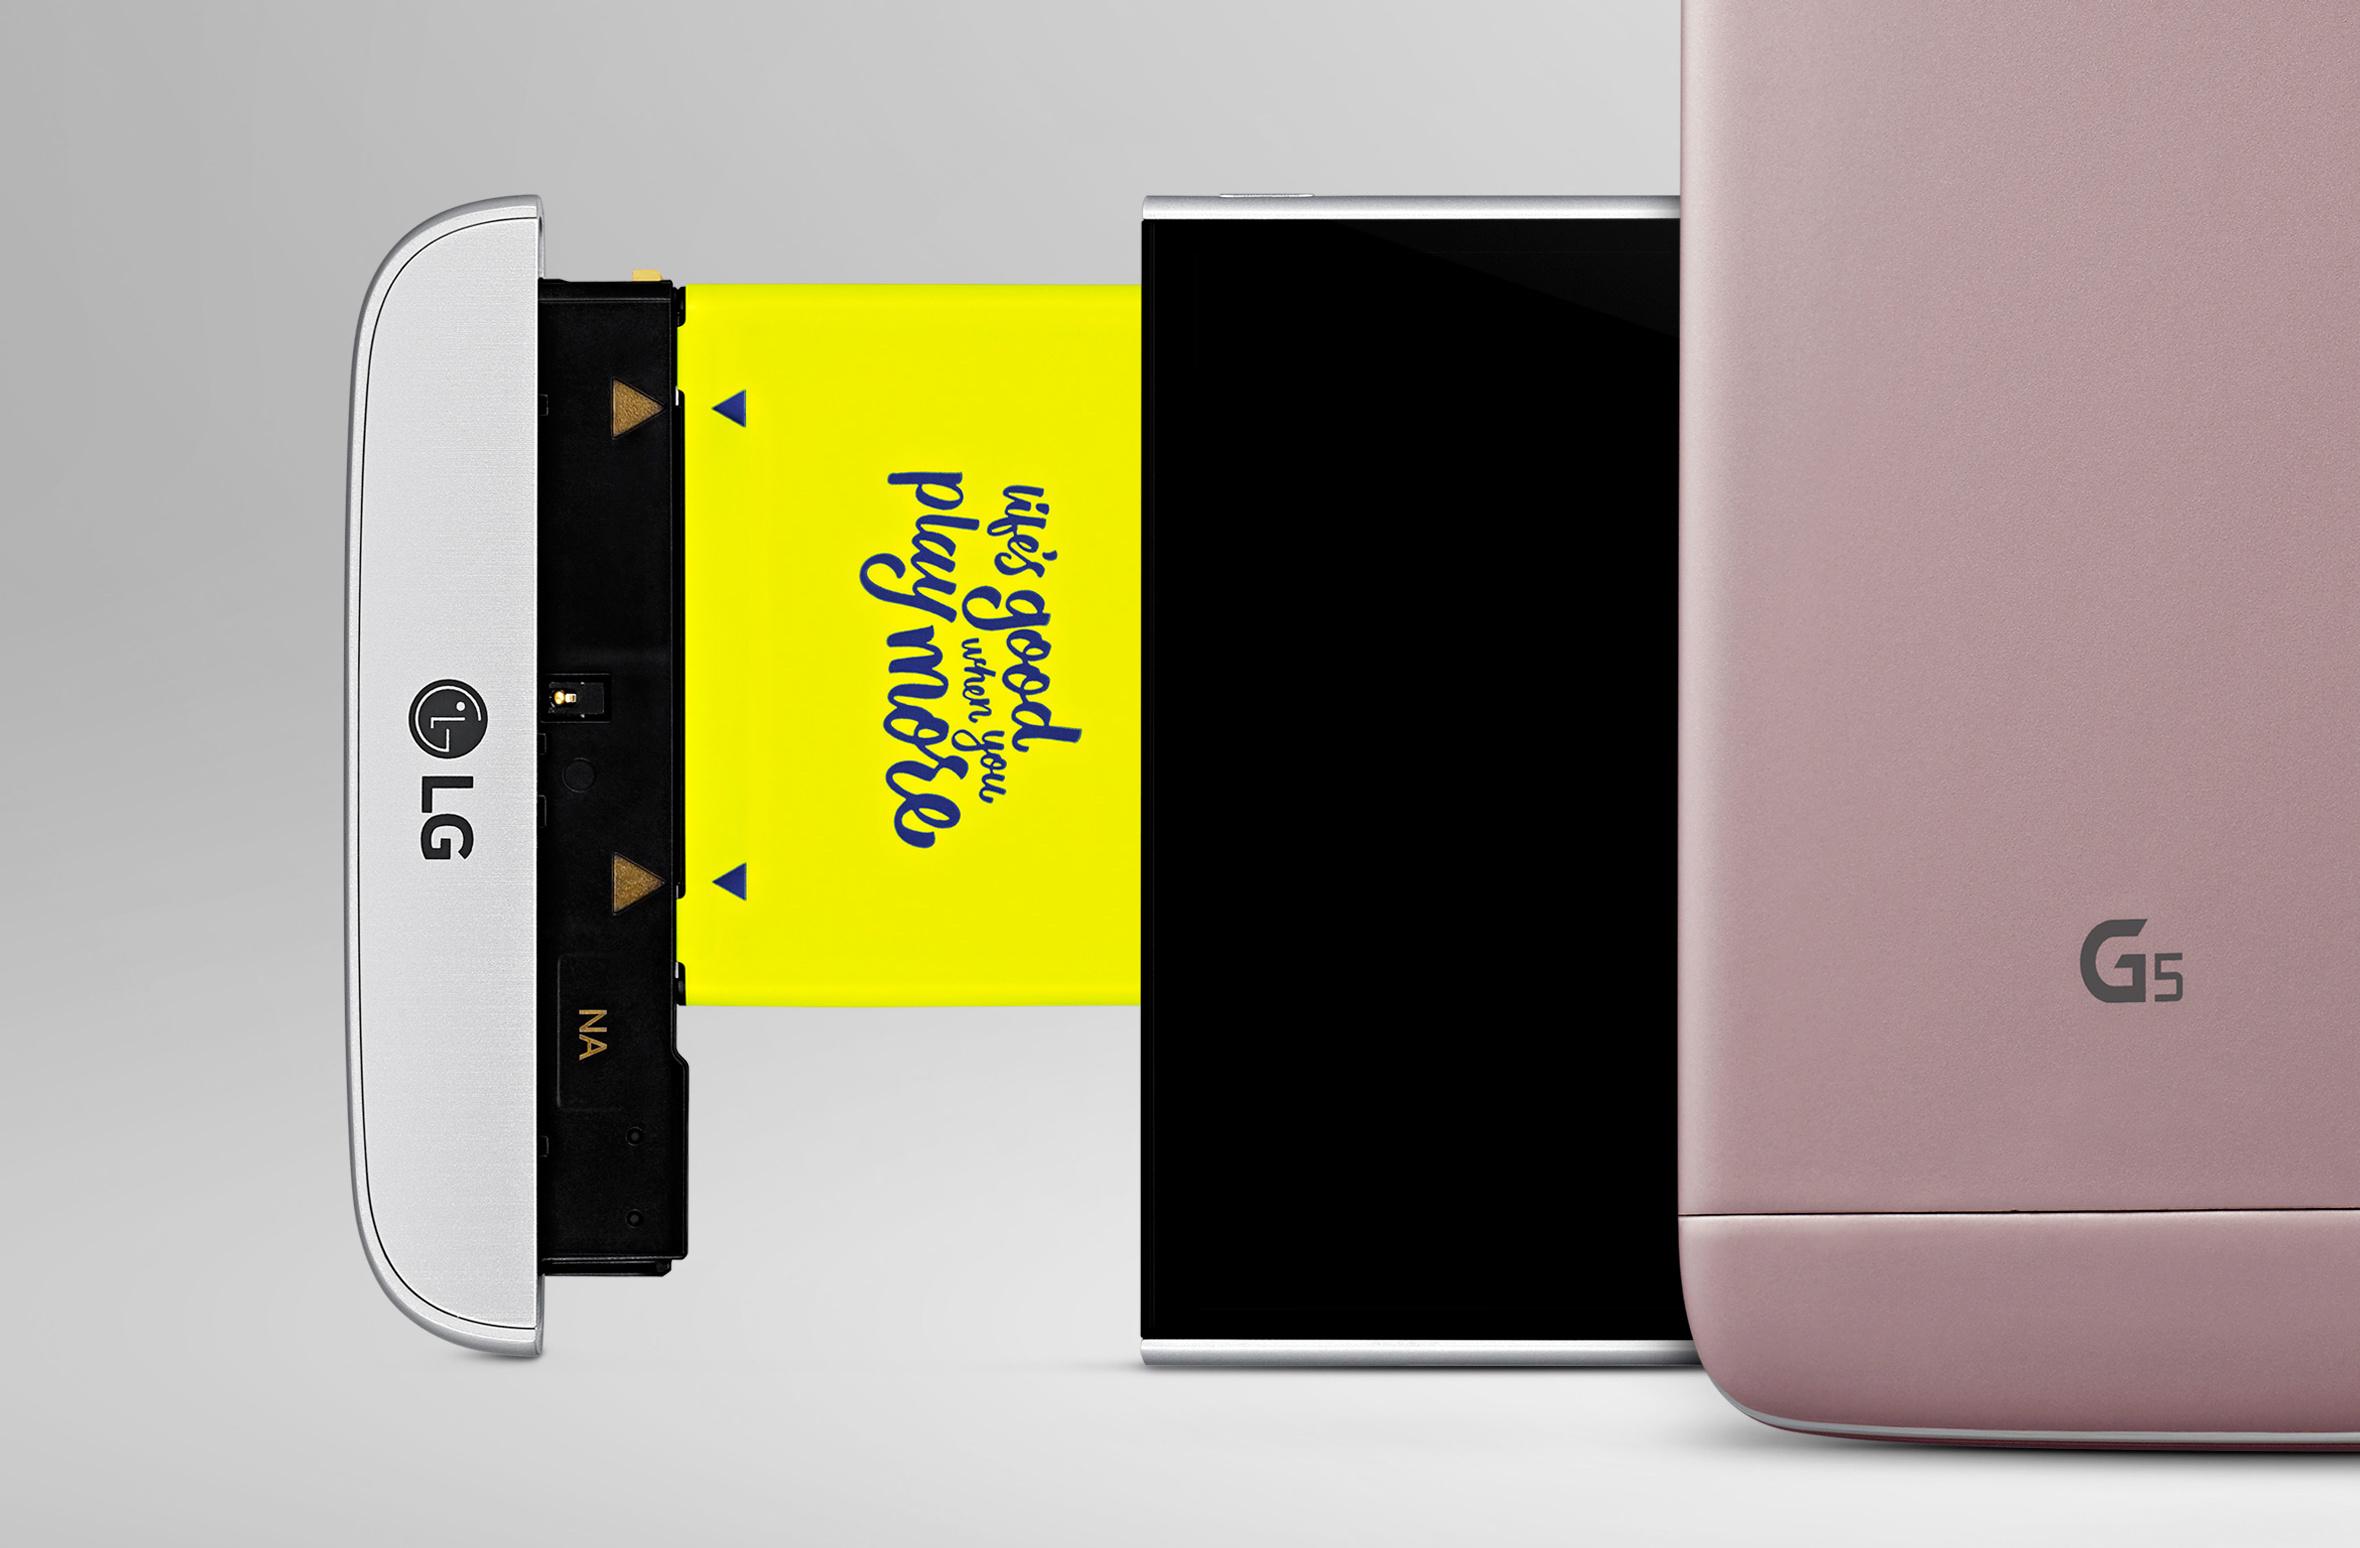 ТОП 10 смартфонов LG